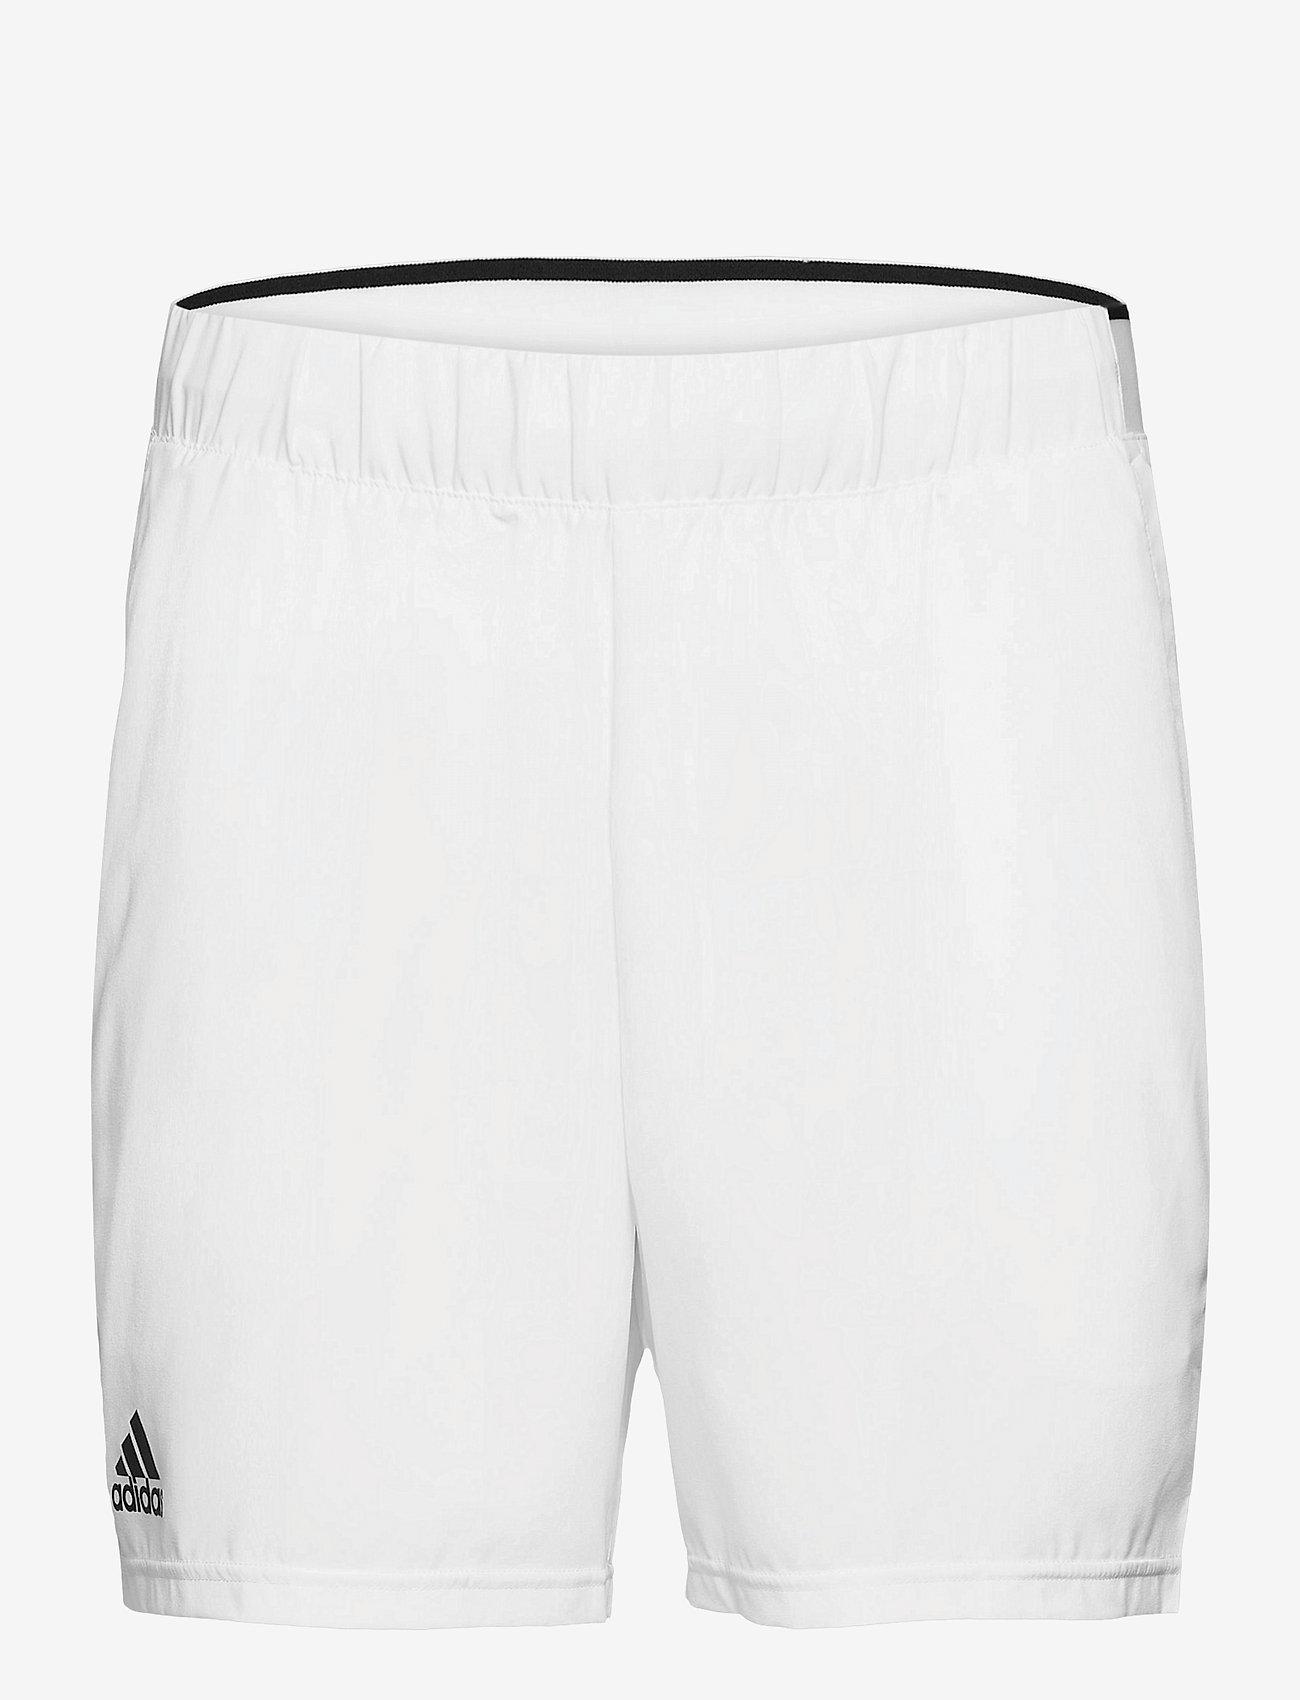 adidas Performance - CLUB STRETCH WOVEN SHORTS - training korte broek - 000/white - 1